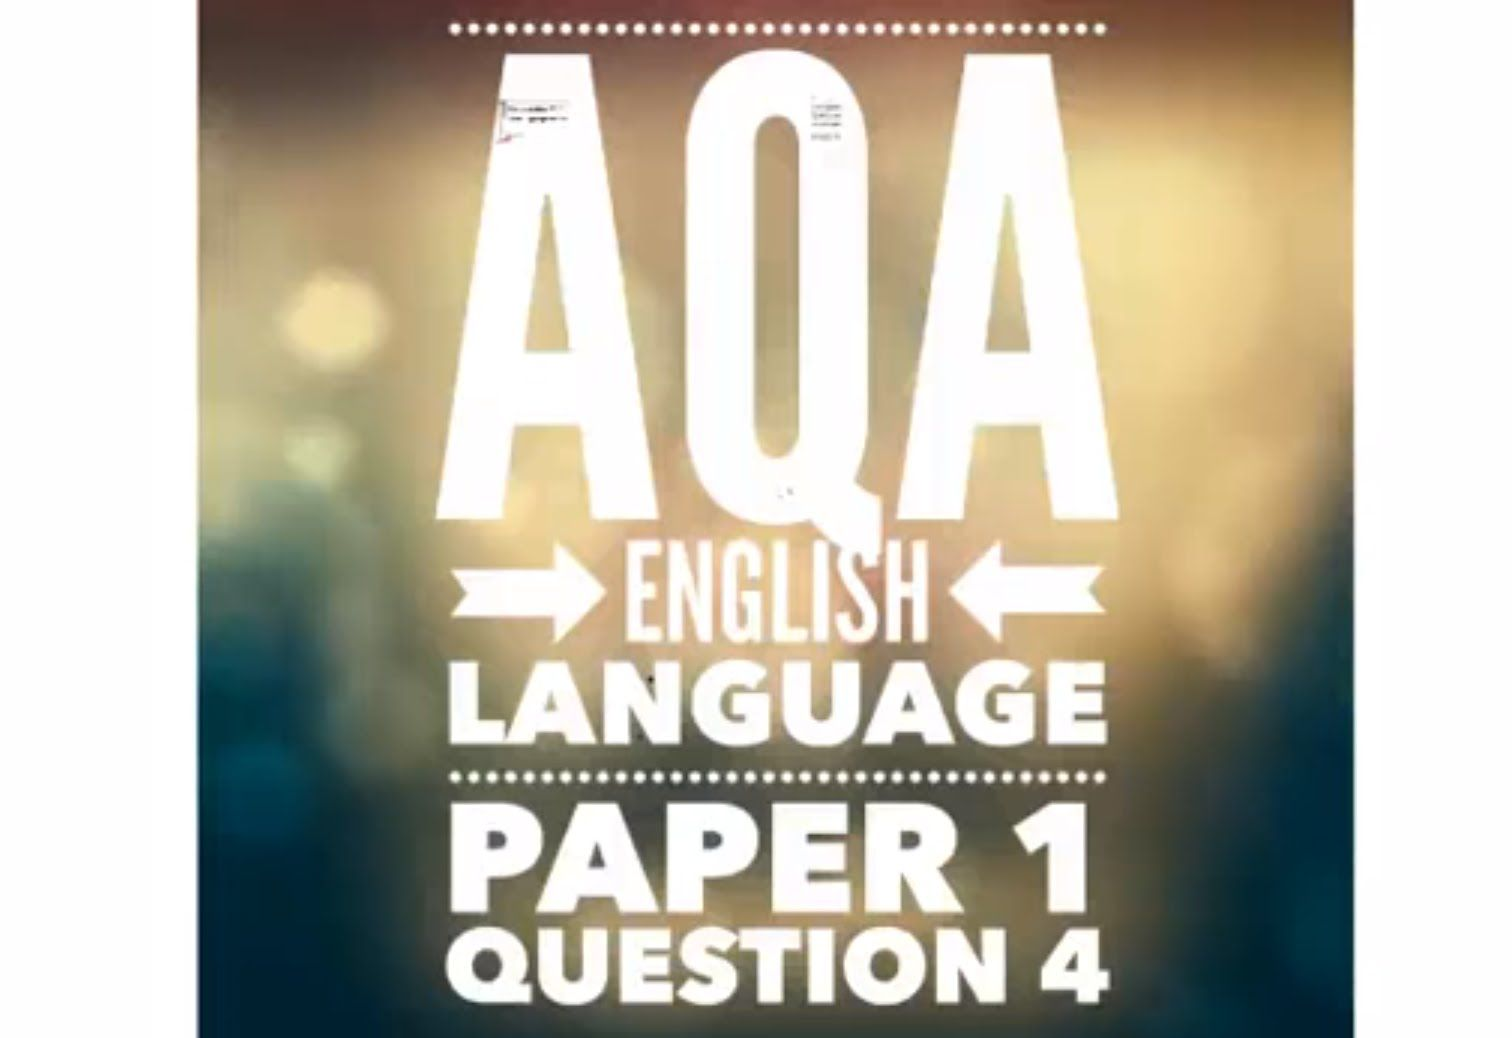 Aqa Gcse English Language Paper 1 Question 4 Exam